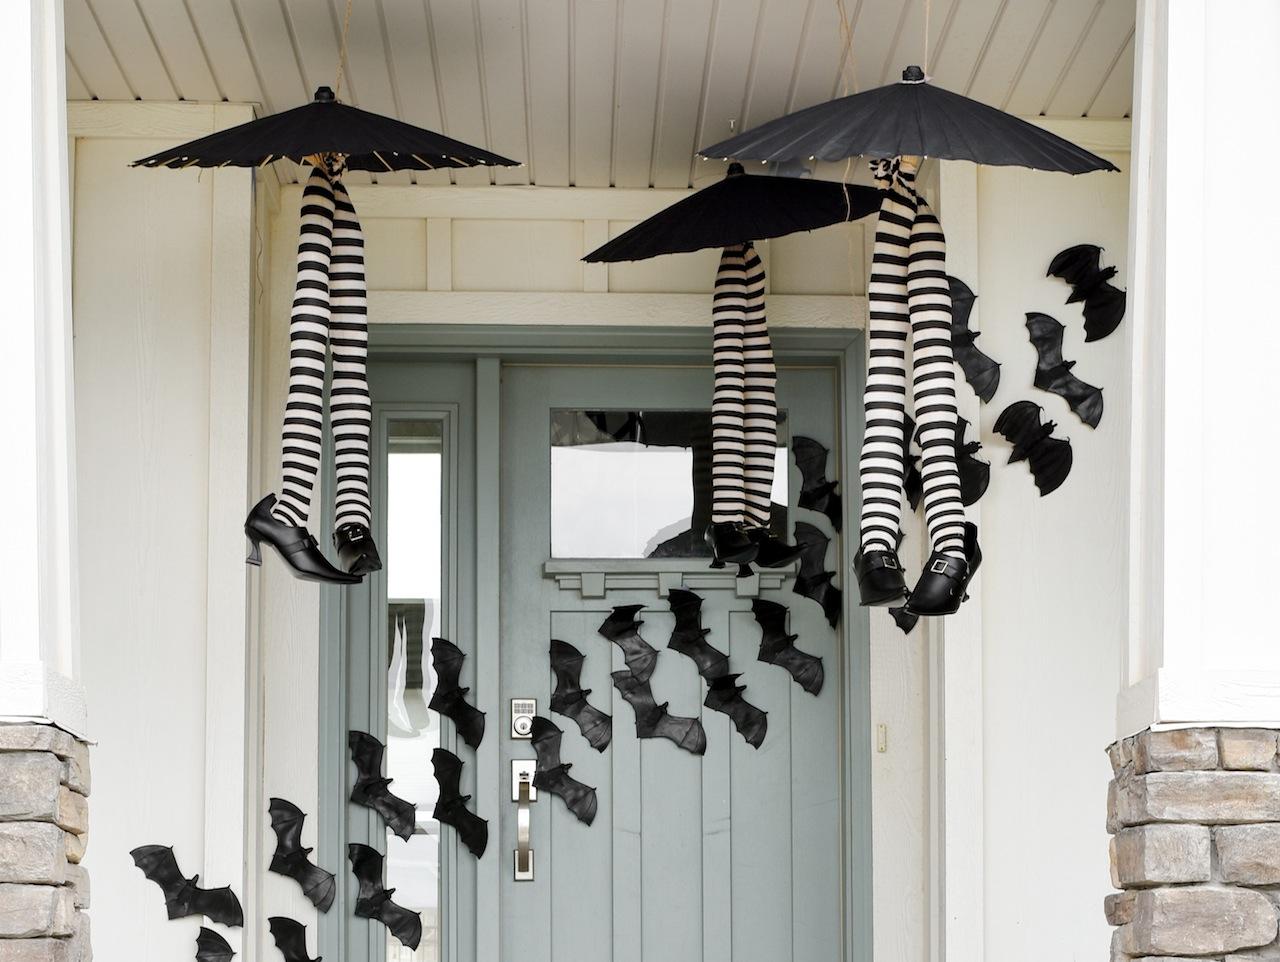 DIY Hanging Witch Umbrellas via Kara's Party Ideas